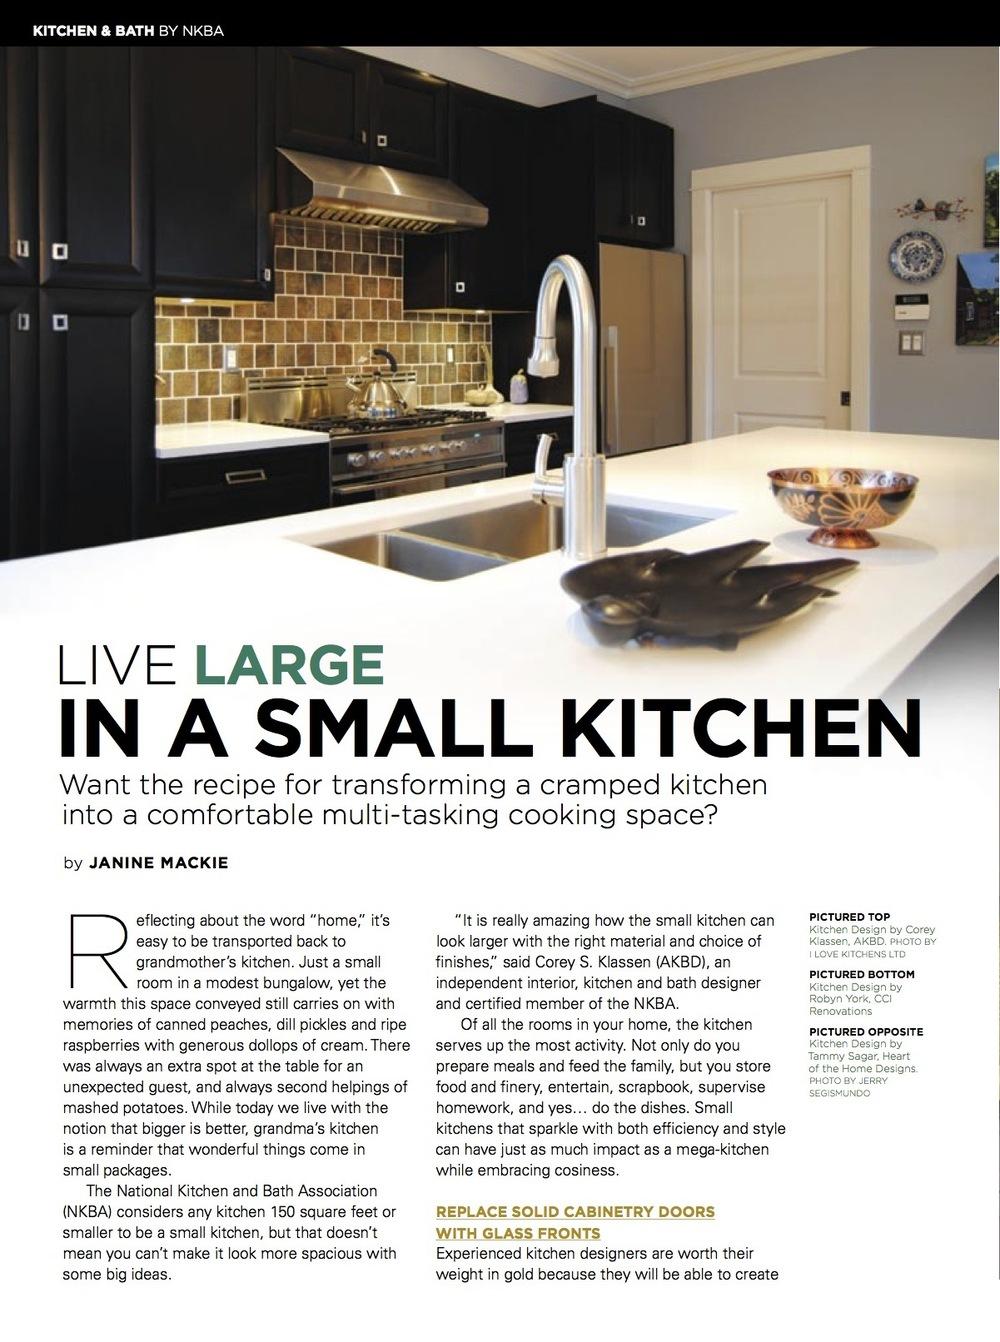 56-58_60-NKBA-Kitchen-Small-Design.jpg